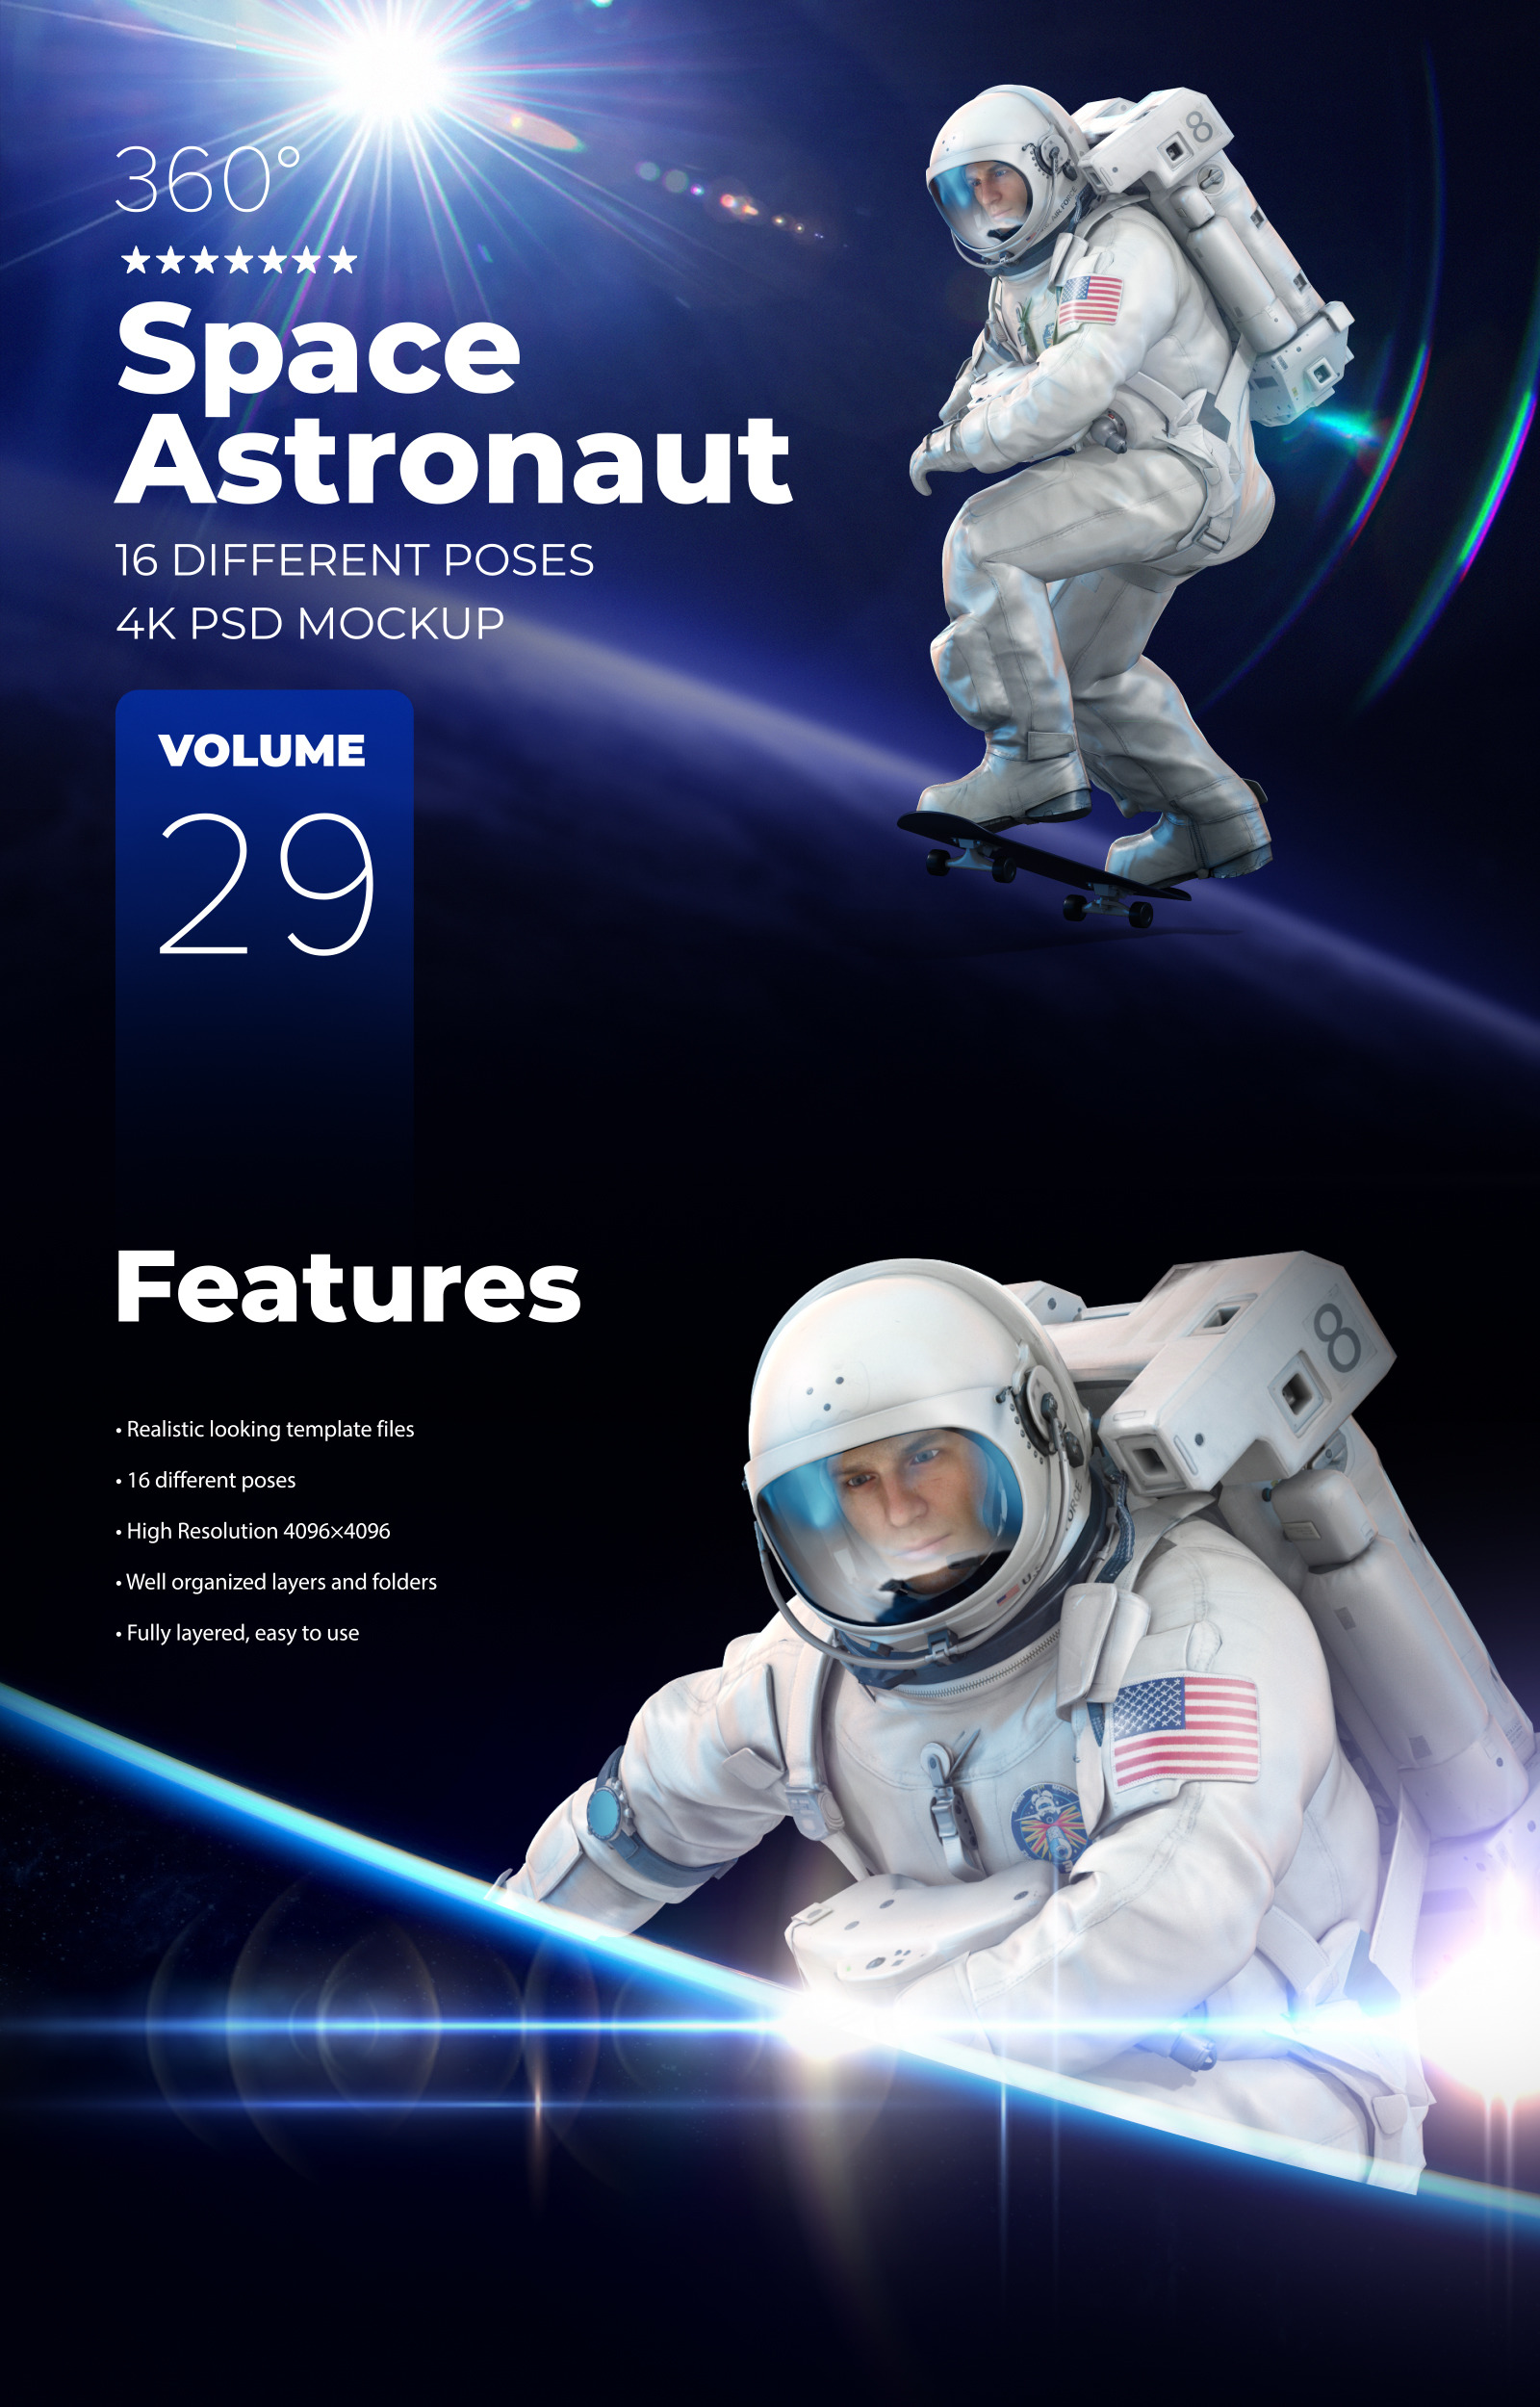 3D Mockup Space Astronaut #29